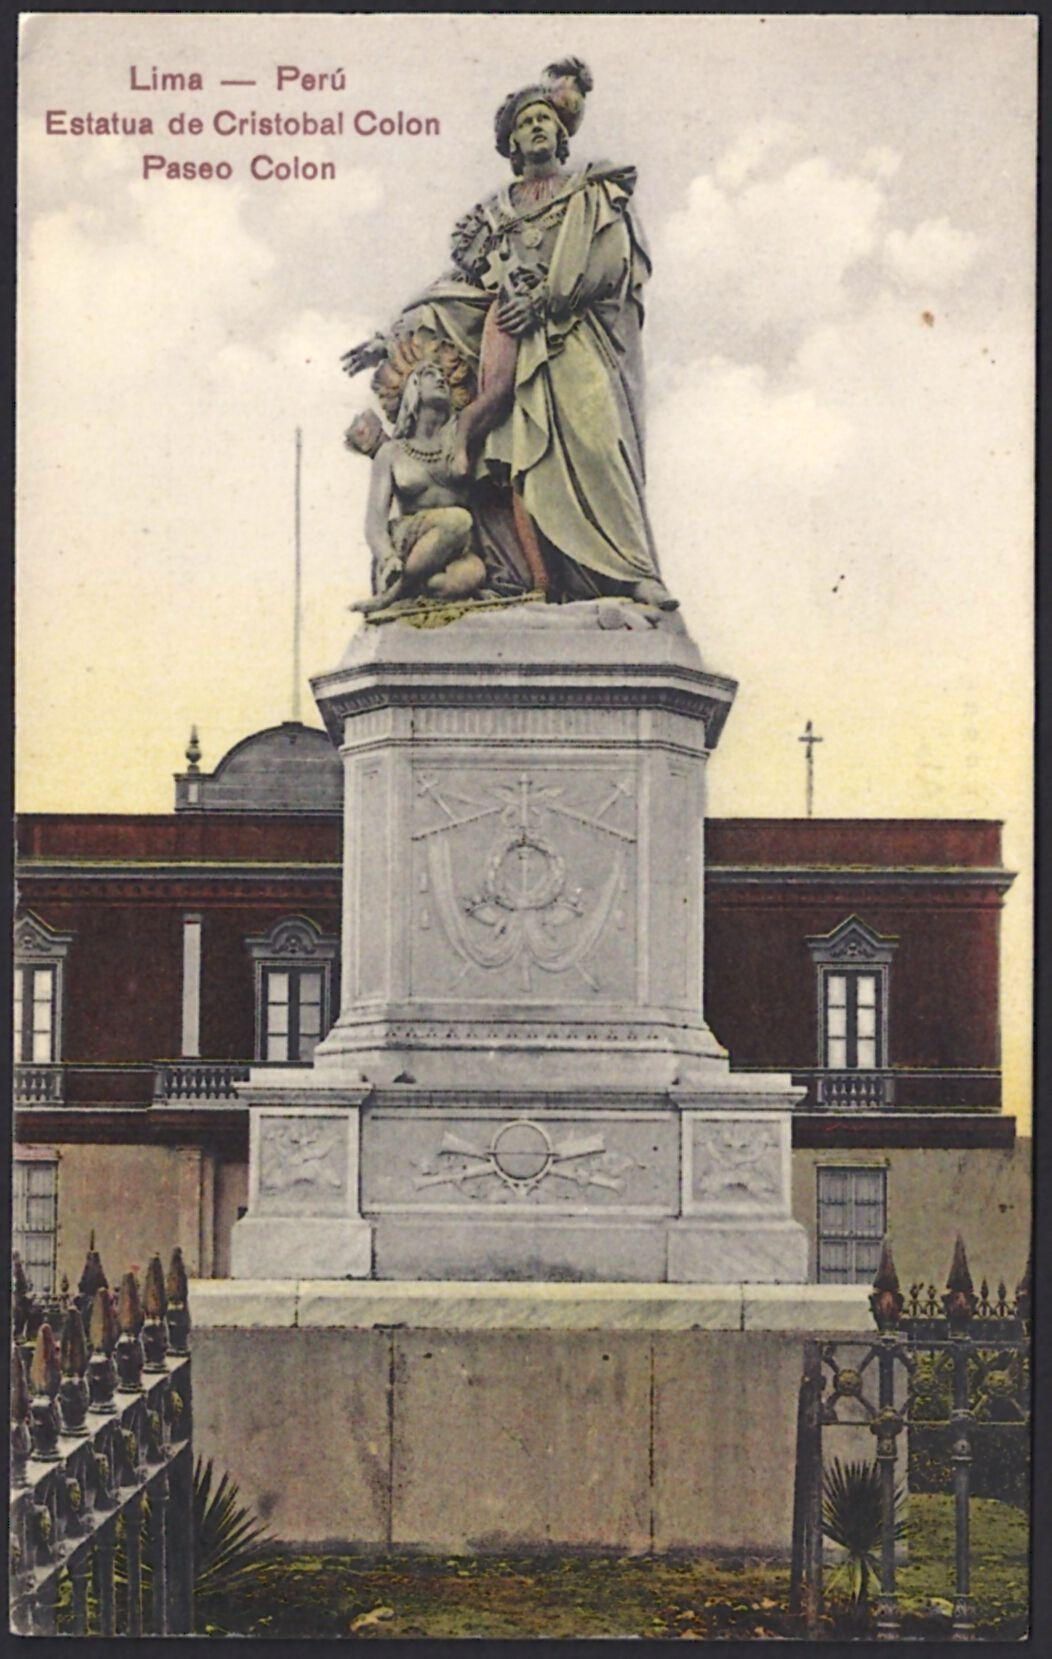 statue of christopher columbus cristobal colon in lima peru on